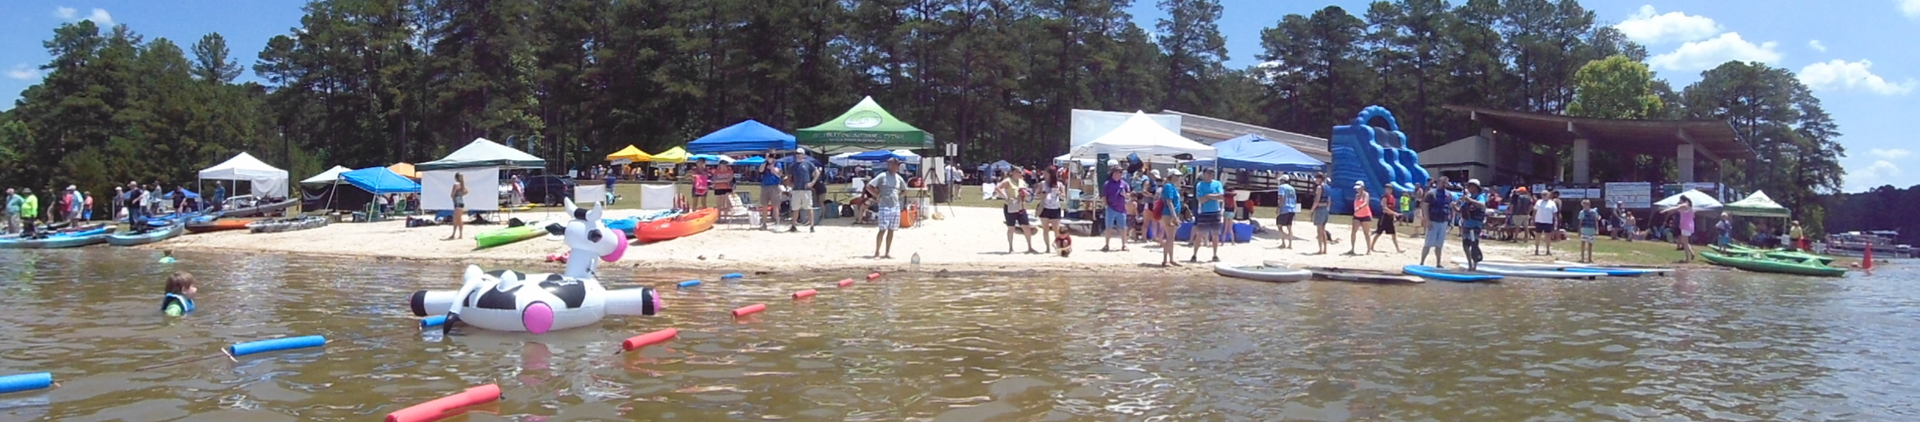 The BlueWay Festival